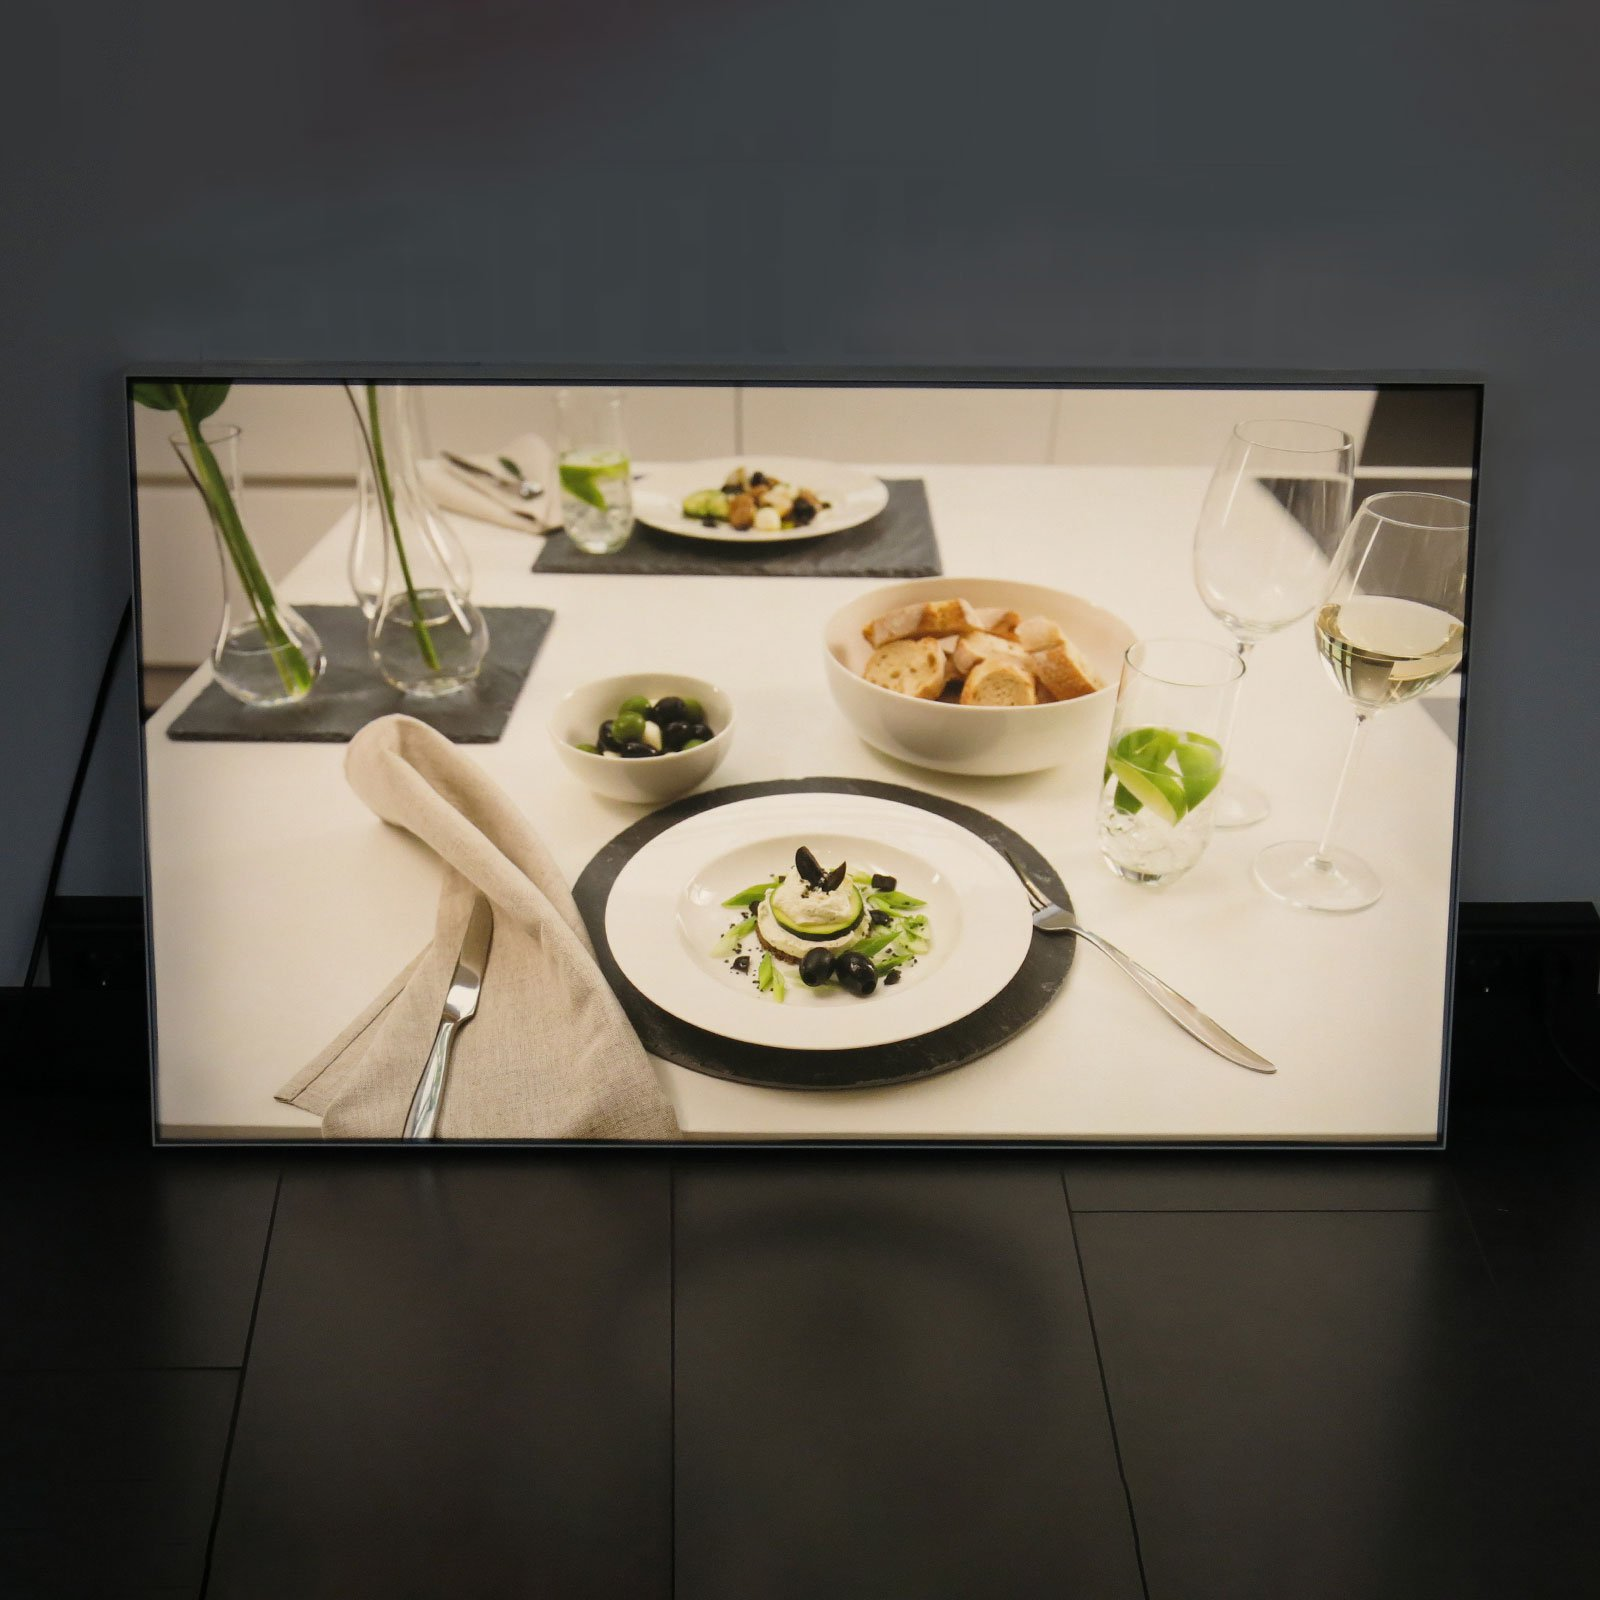 LGA 2x2 Module LED-vegglampe, 62,5 x 62,5 cm